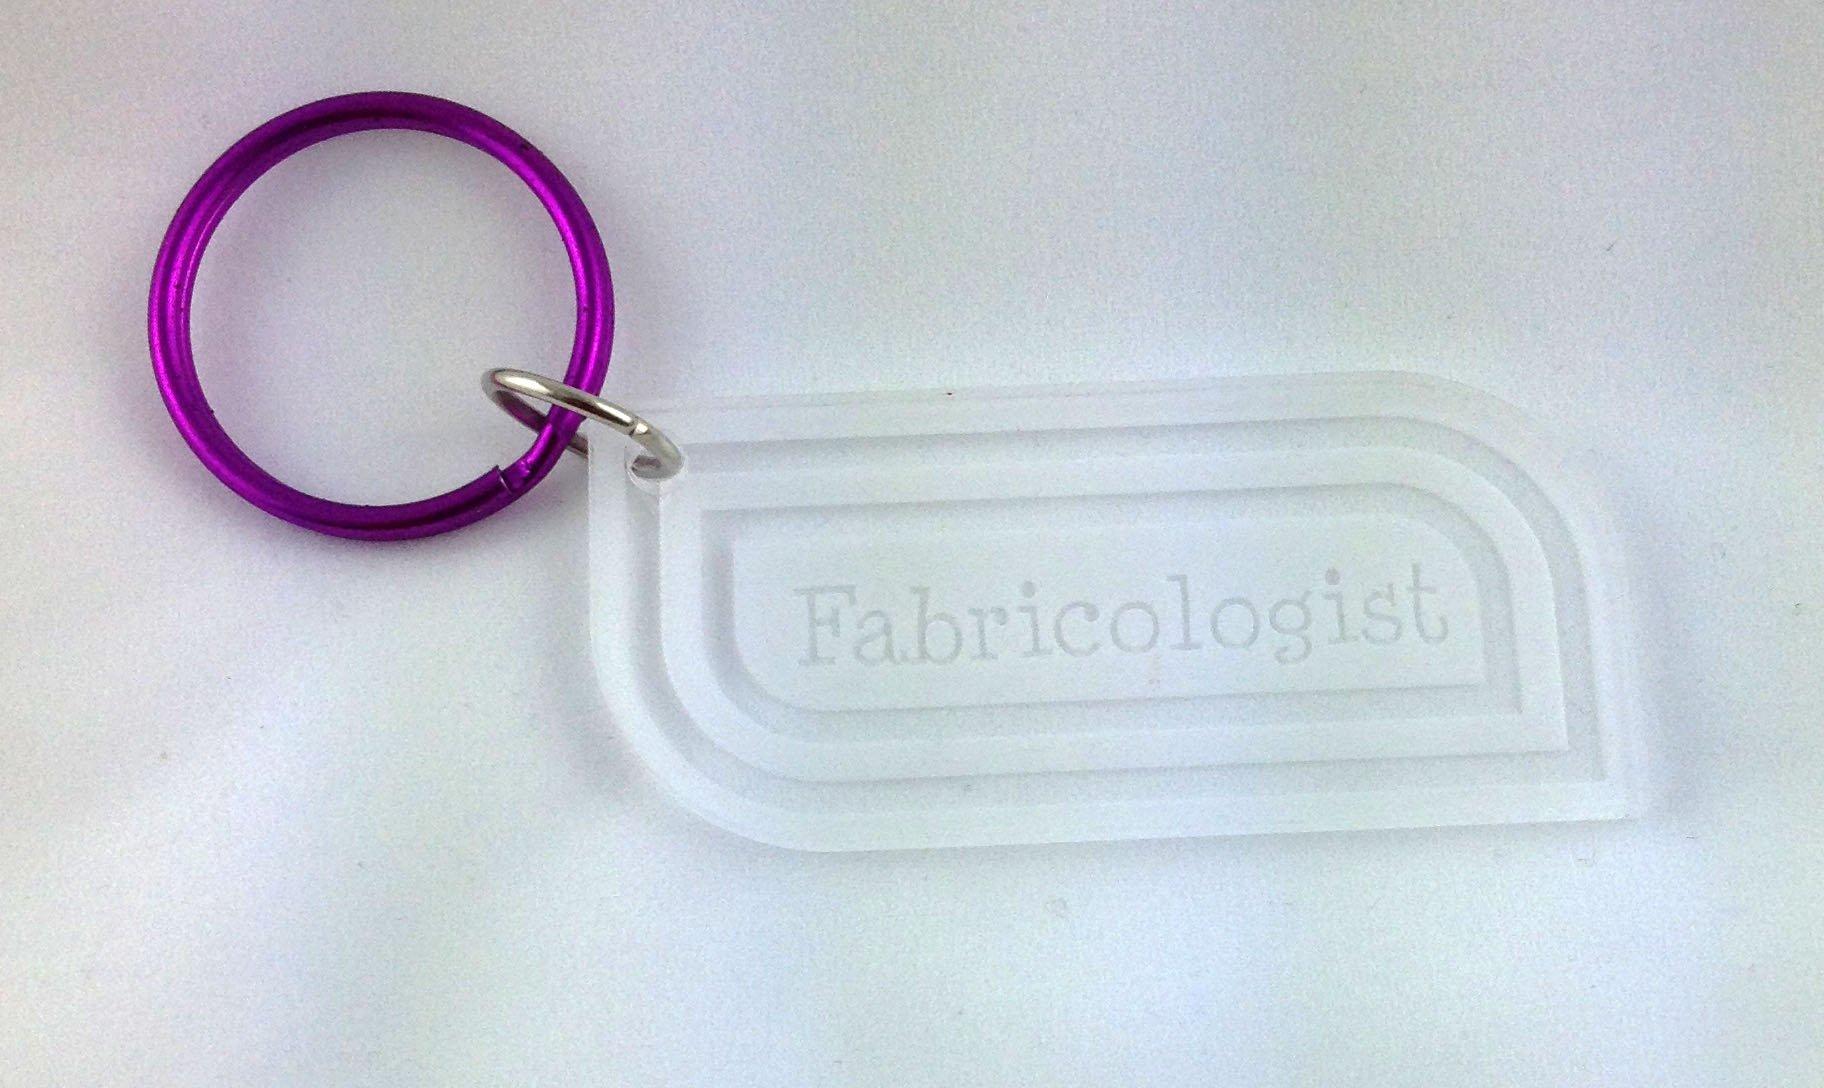 Key Ring-Fabricologist